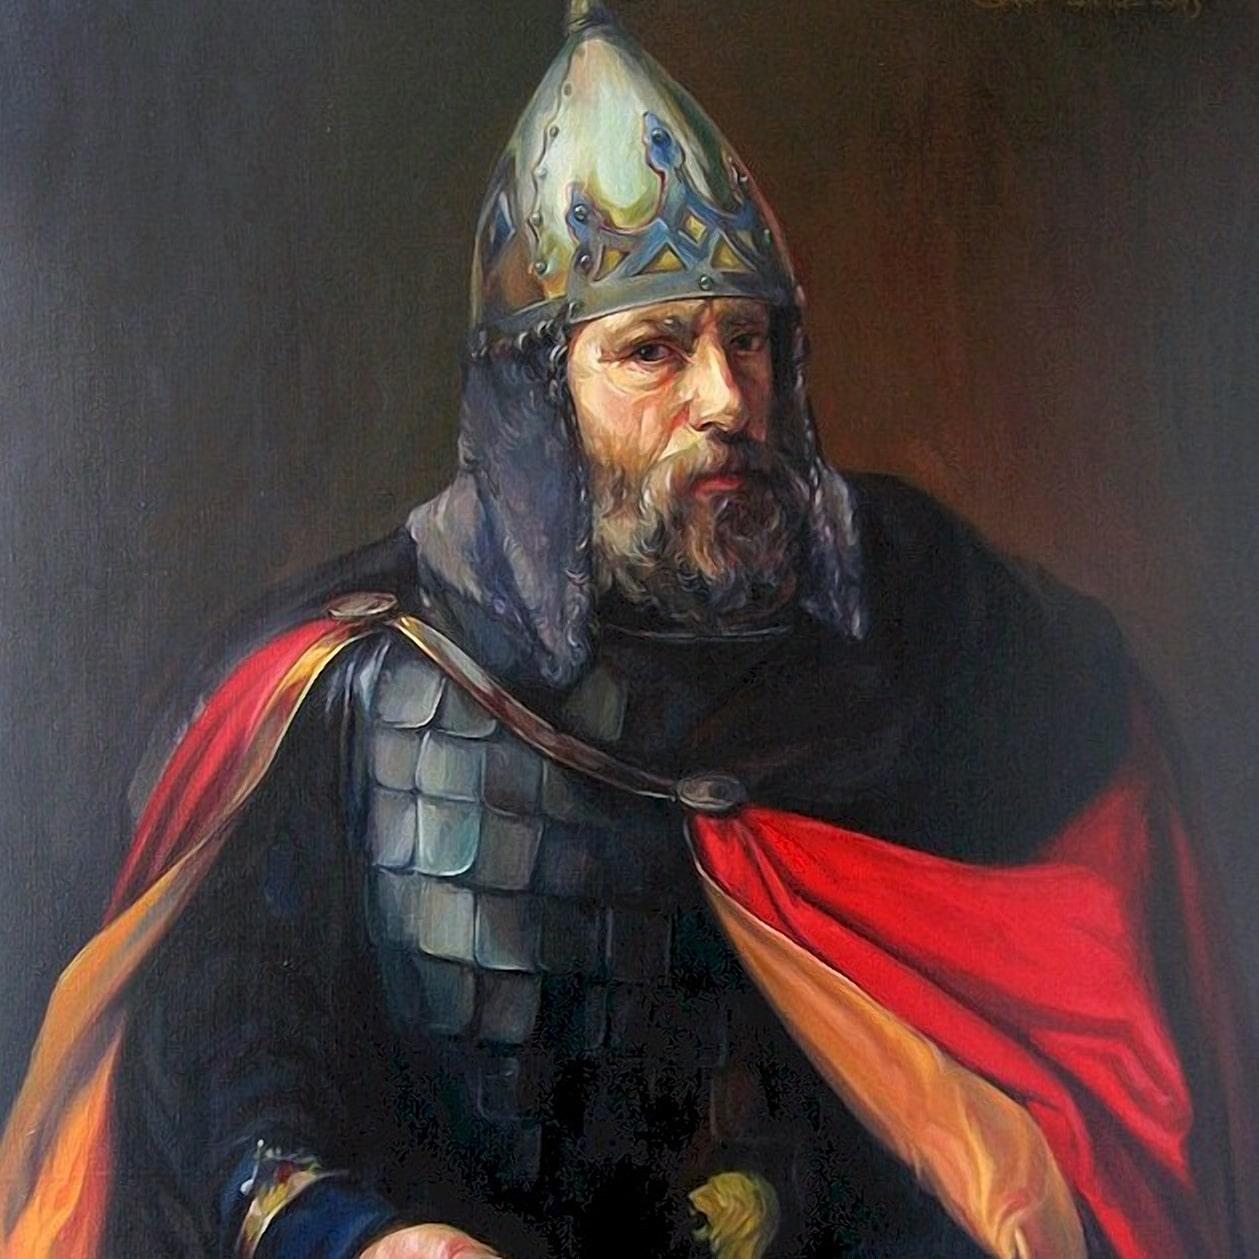 Изяслав Полоцкий - сводный брат Ярослава Мудрого